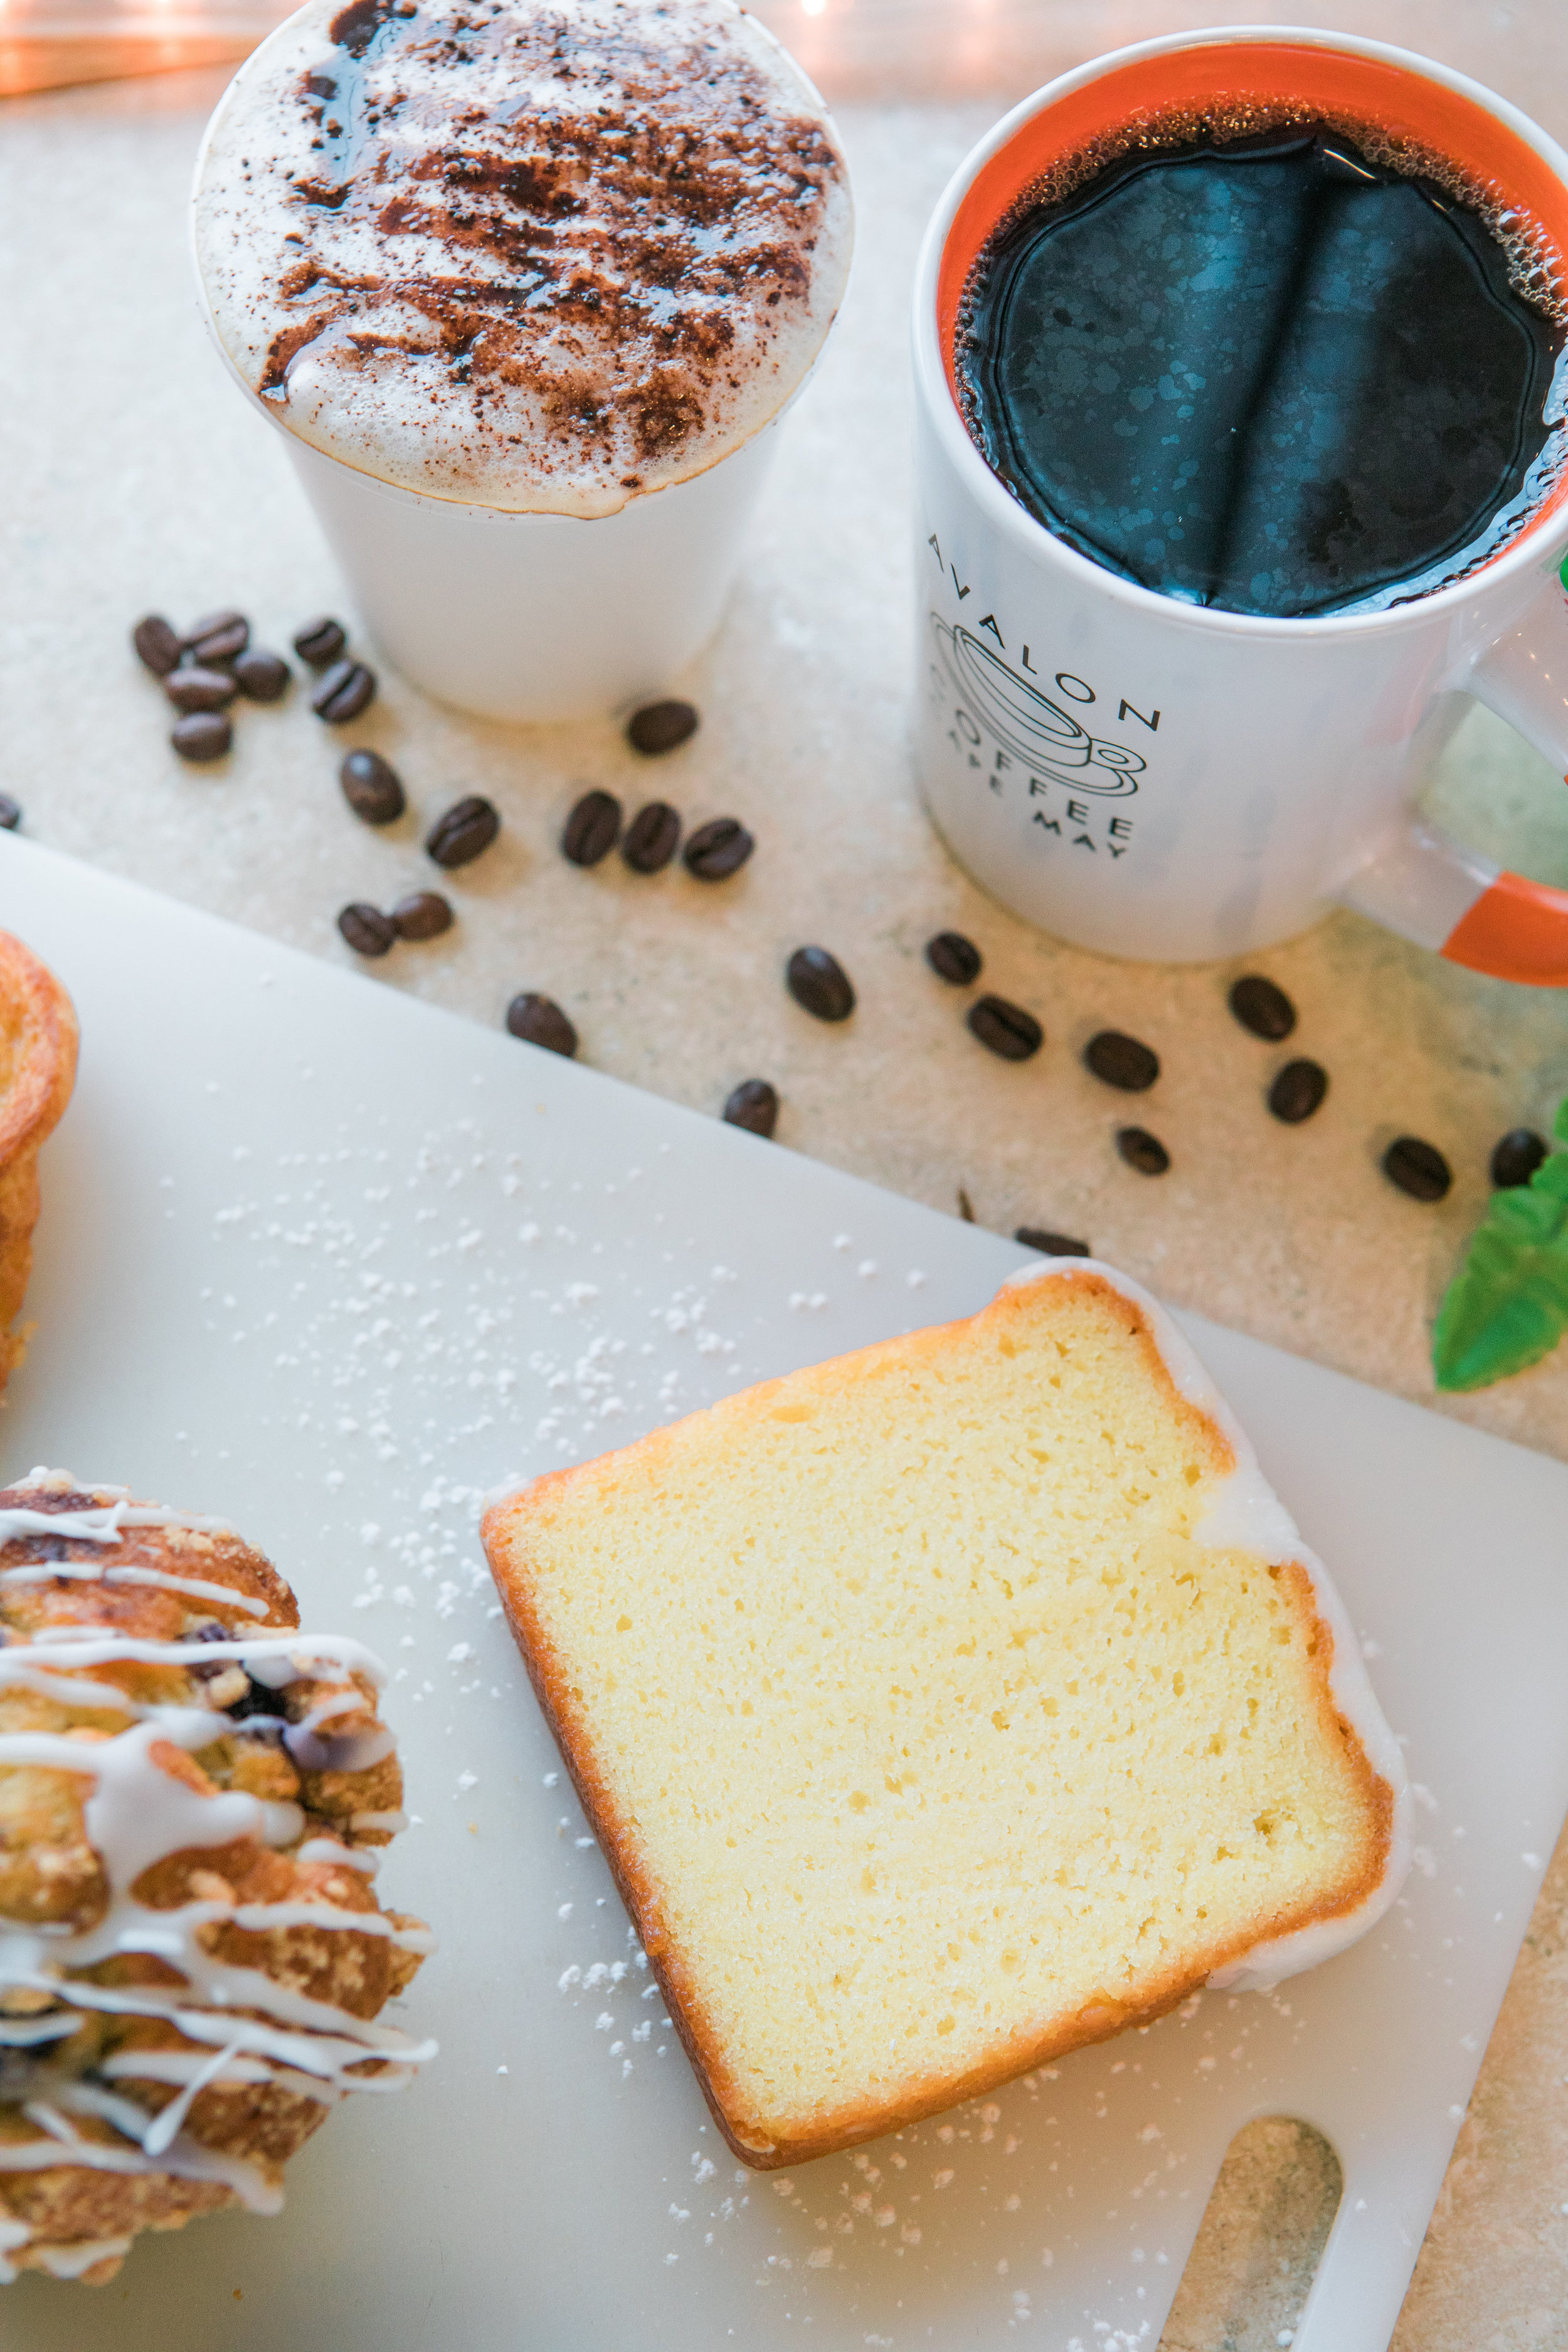 lemon Cake, Coffee, Latte.jpg